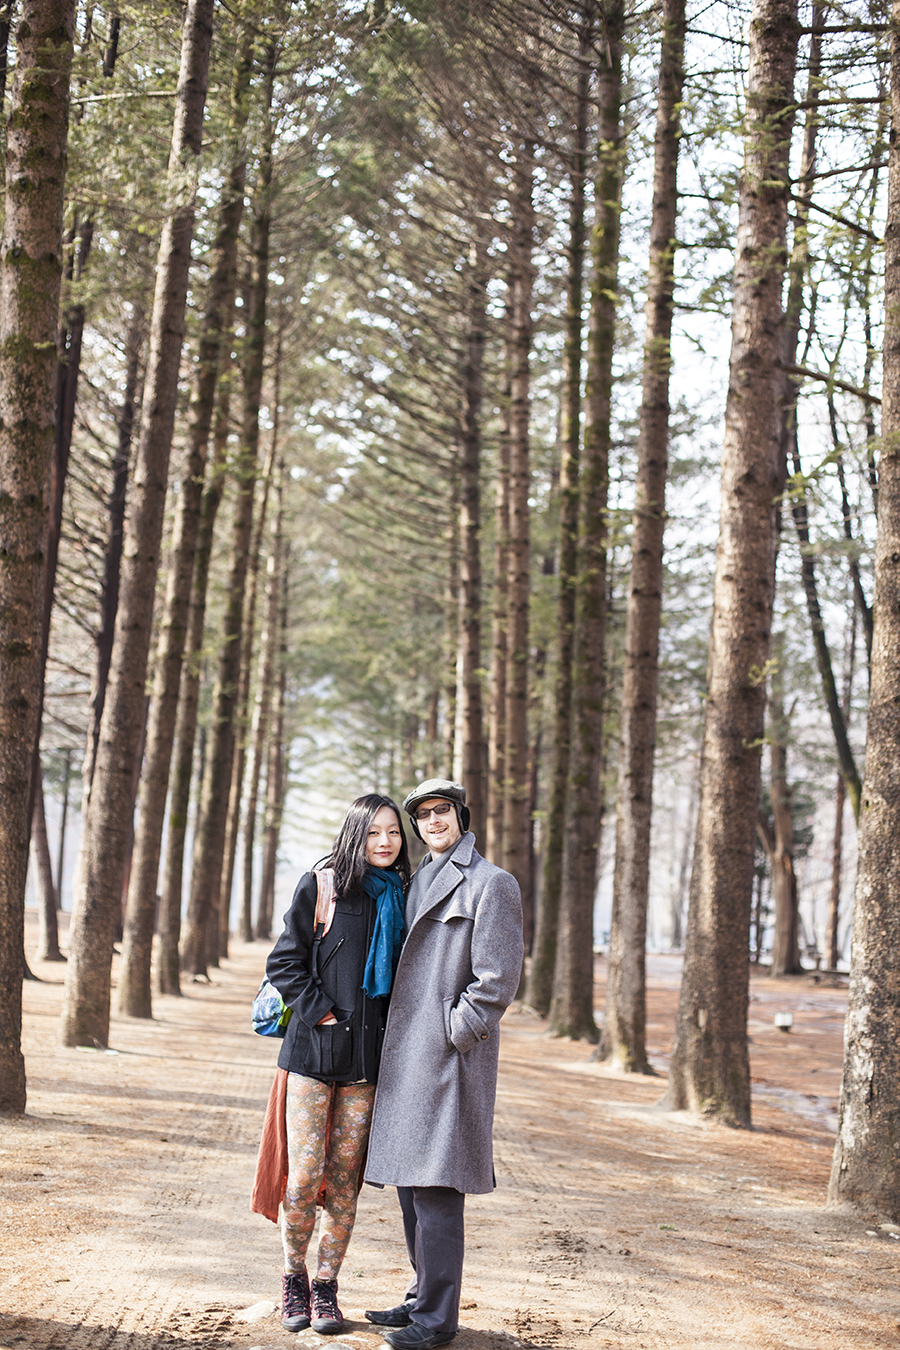 Picture of Ren & Ottie at Nami Island, Gapyeong, South Korea.